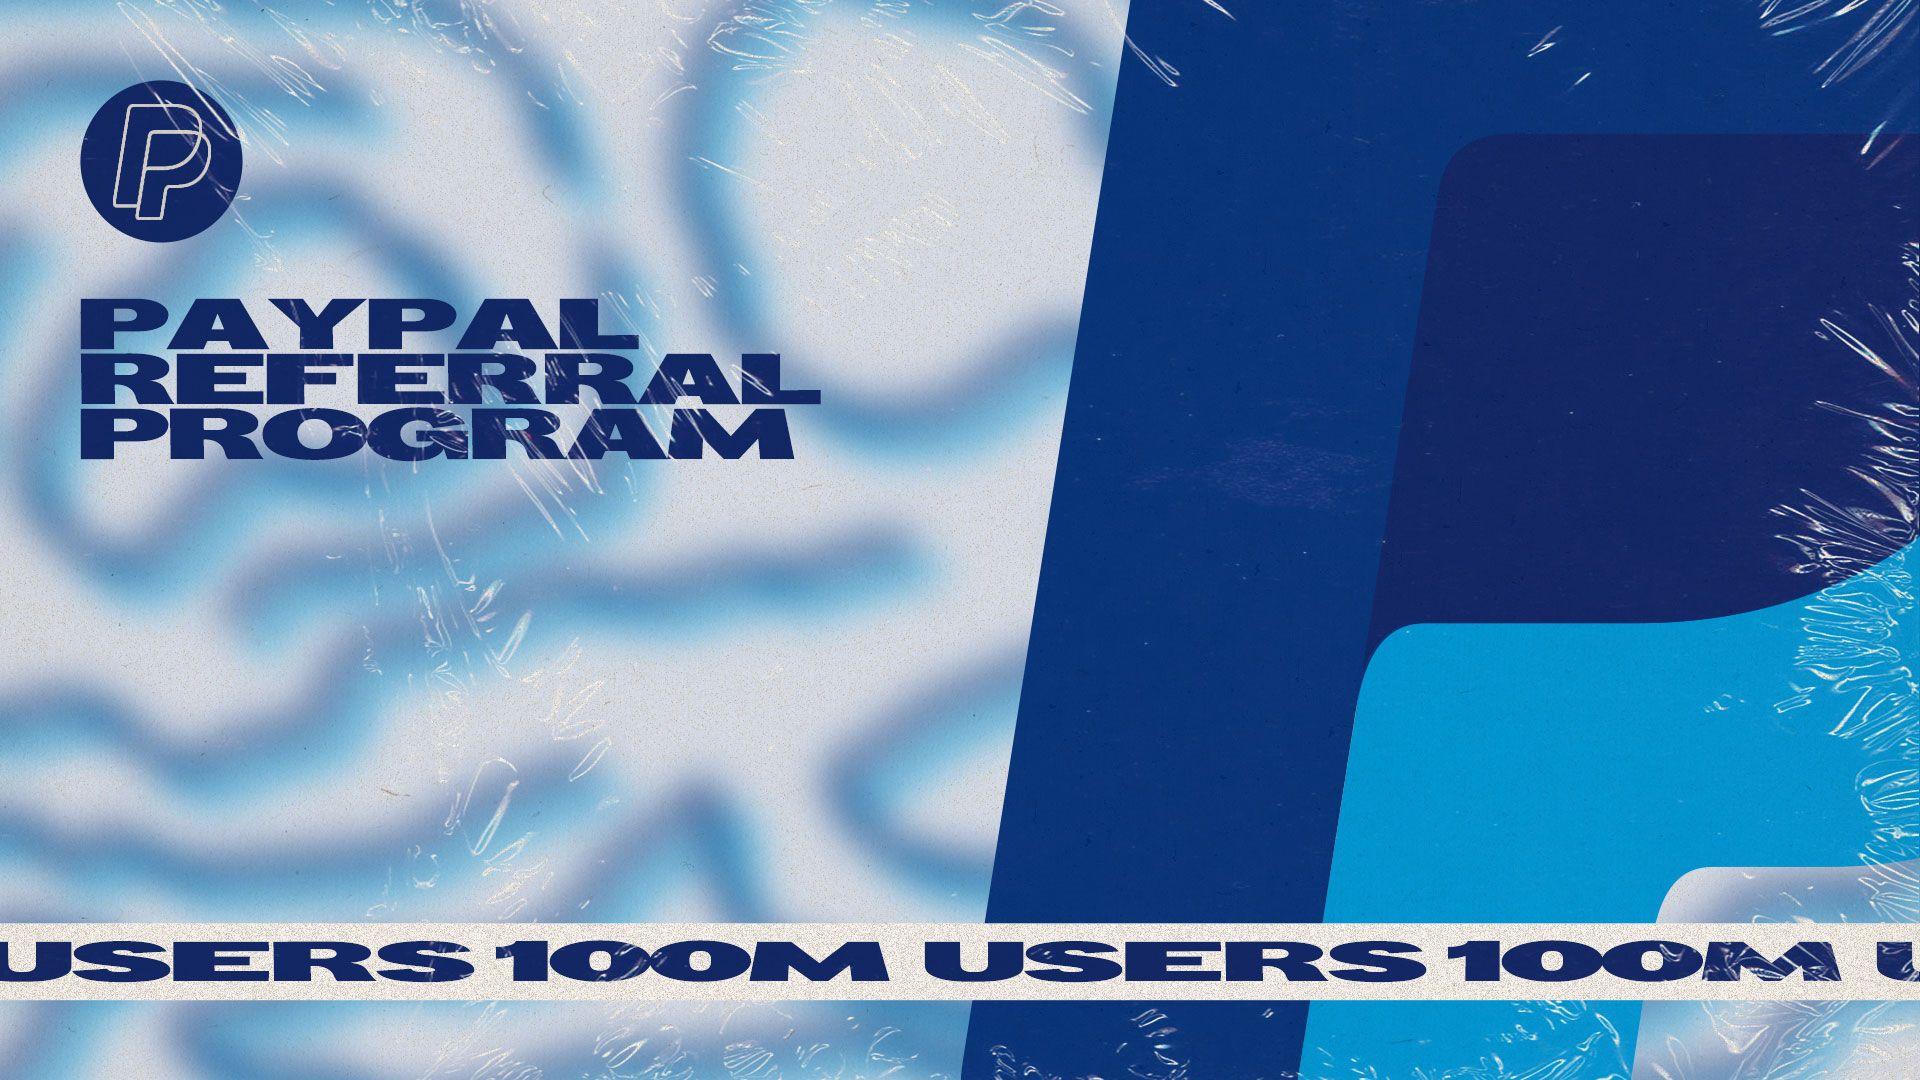 PayPal referral program case study